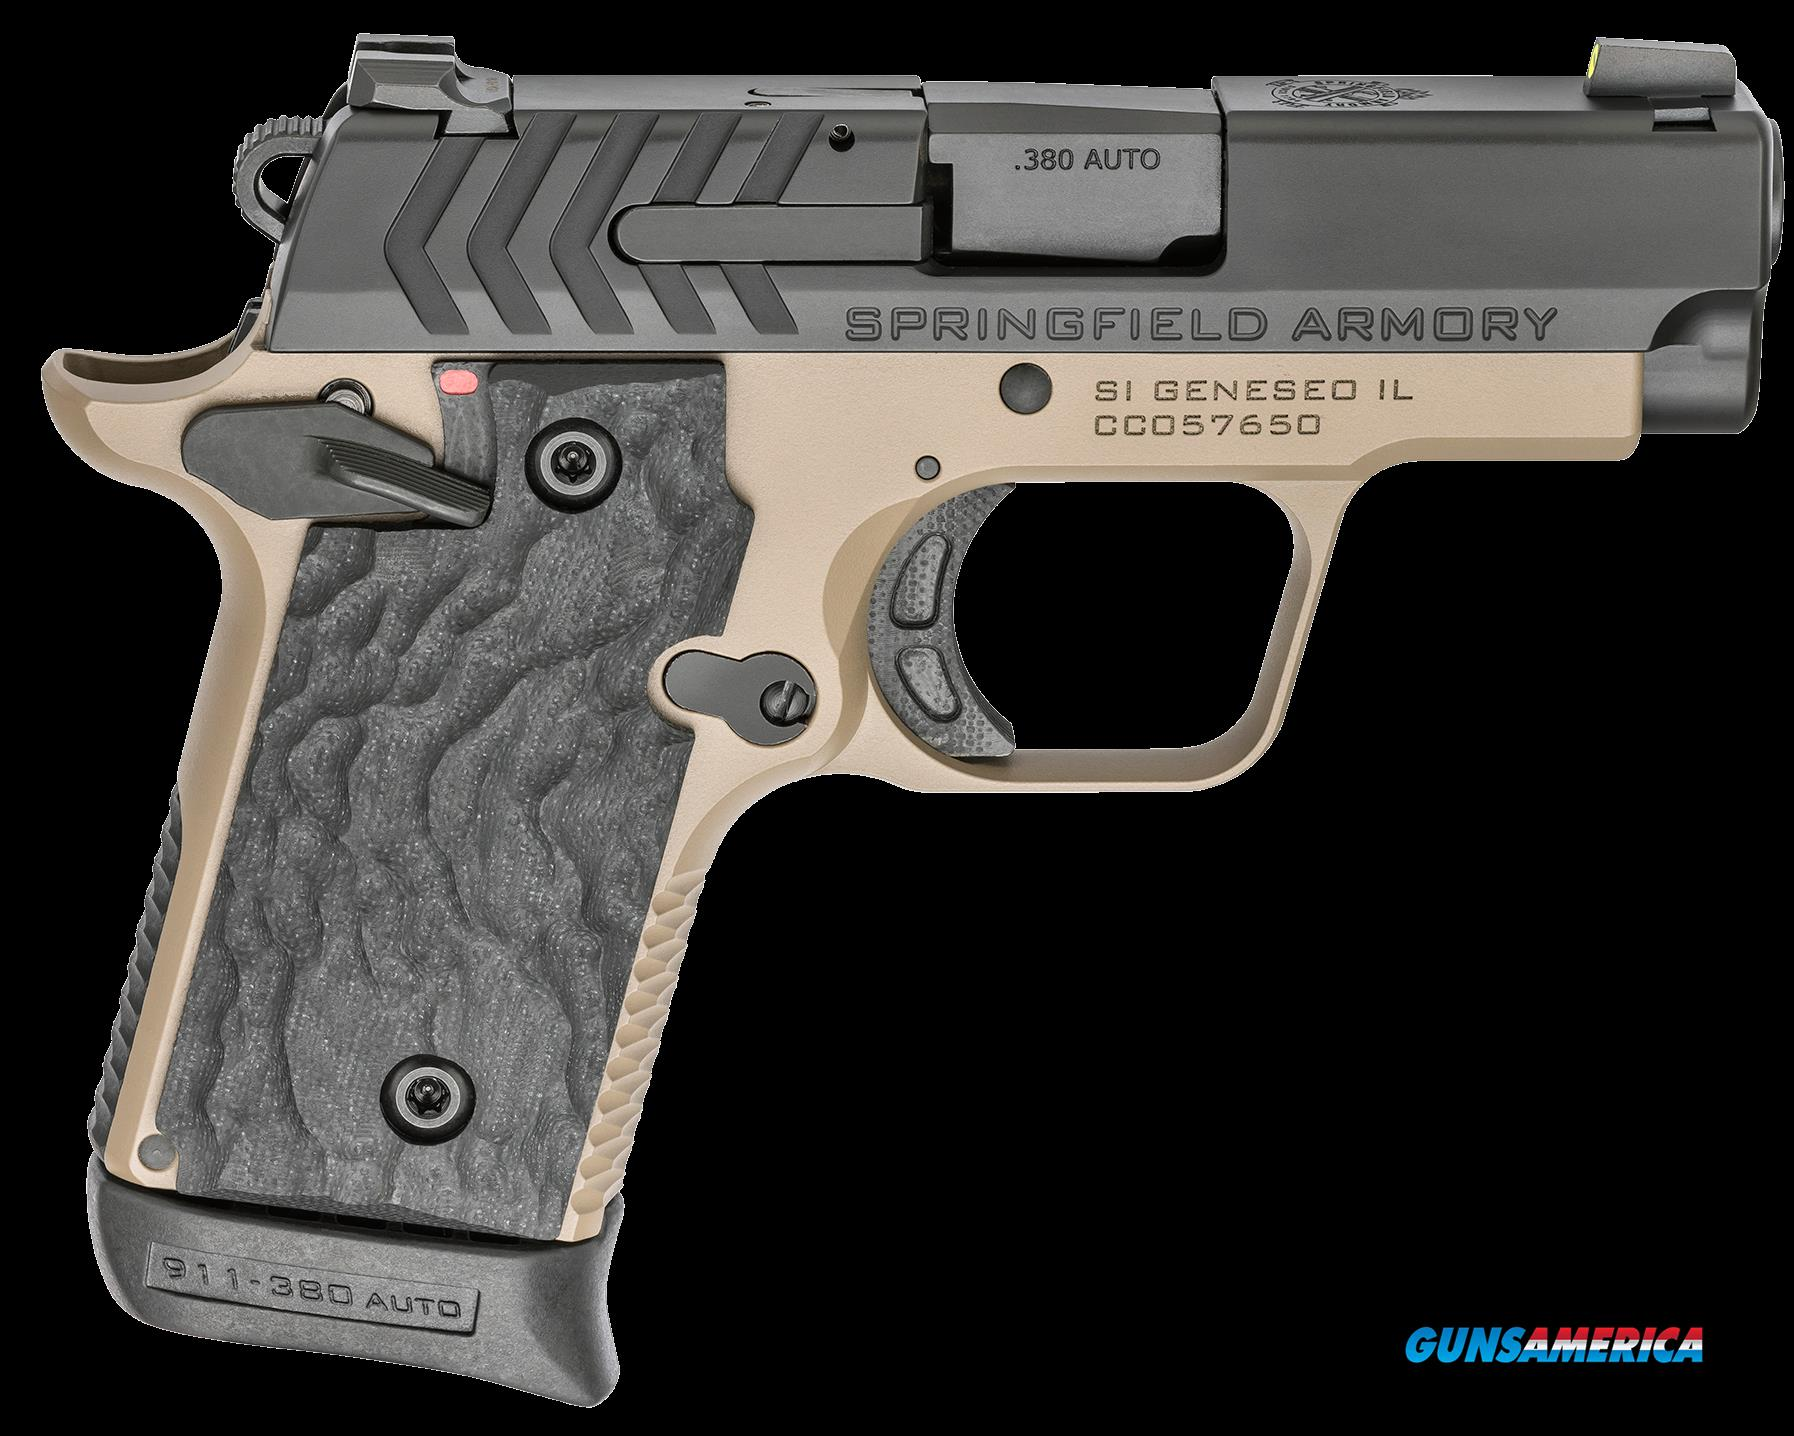 Springfield Armory 911, Spg Pg9109fn      380 911 2.7 Ntrd Fde       6-7r  Guns > Pistols > 1911 Pistol Copies (non-Colt)